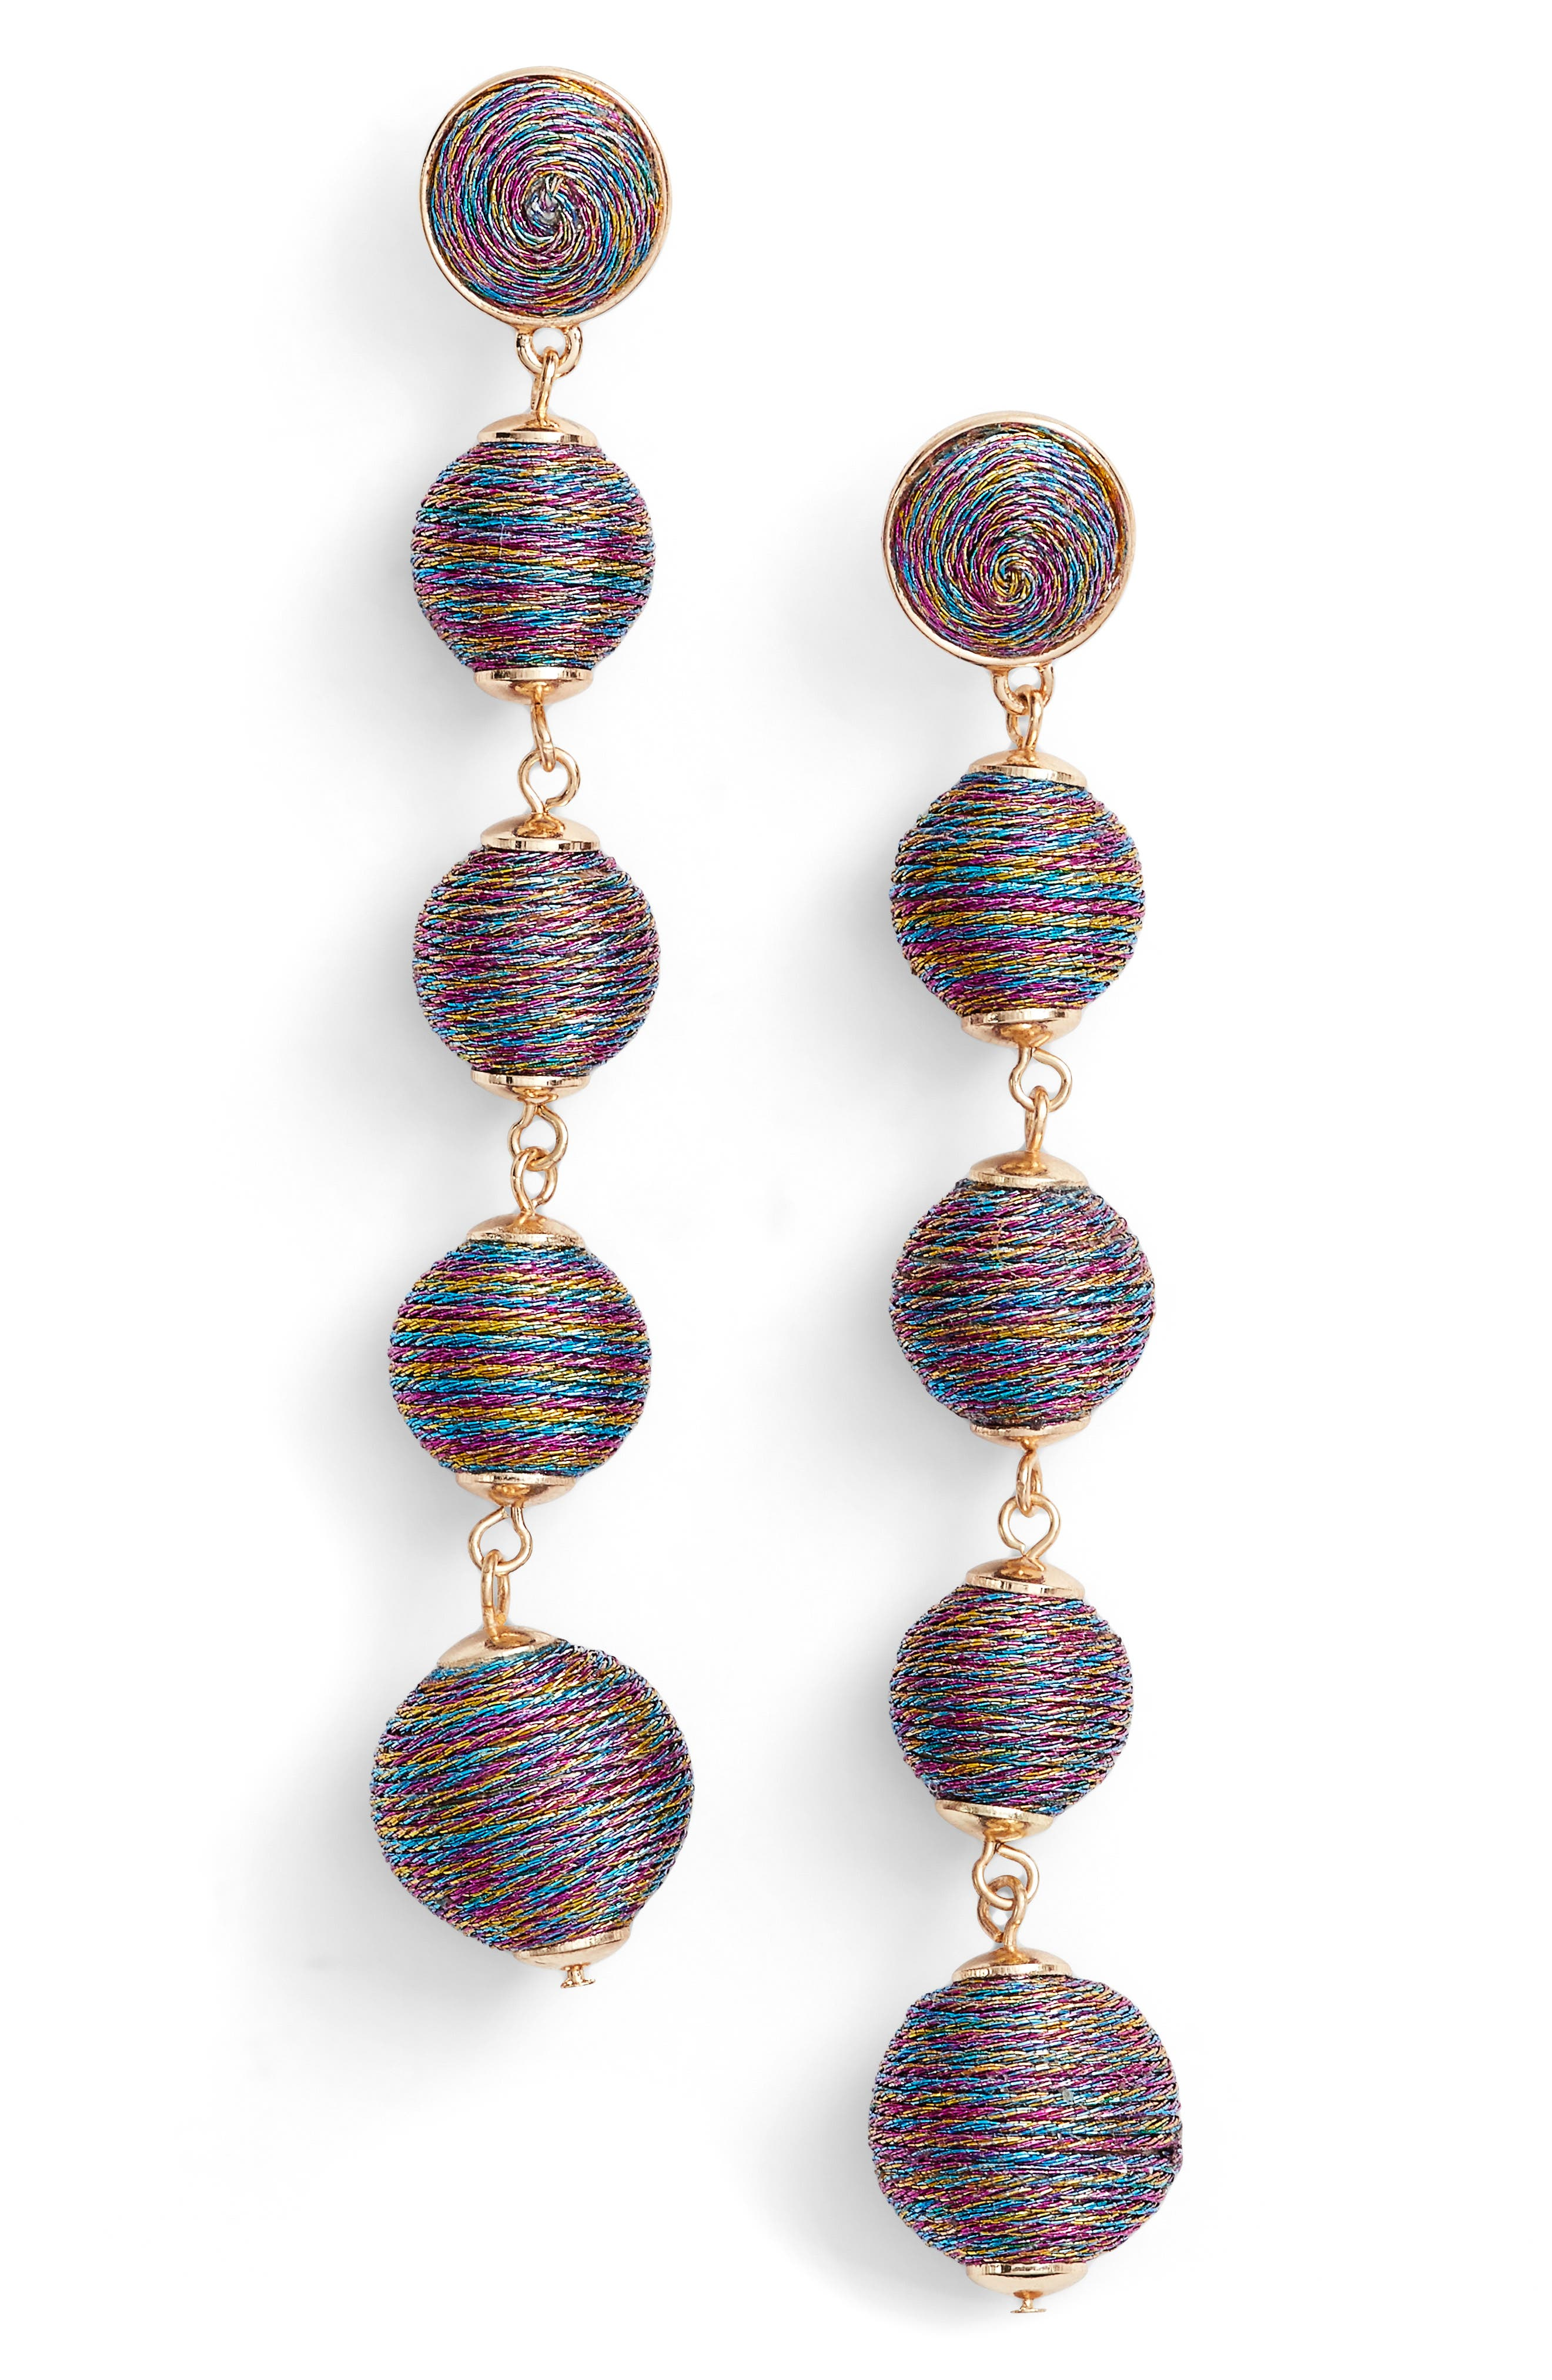 Baublebar Metallic Crispin Ball Statement Earrings